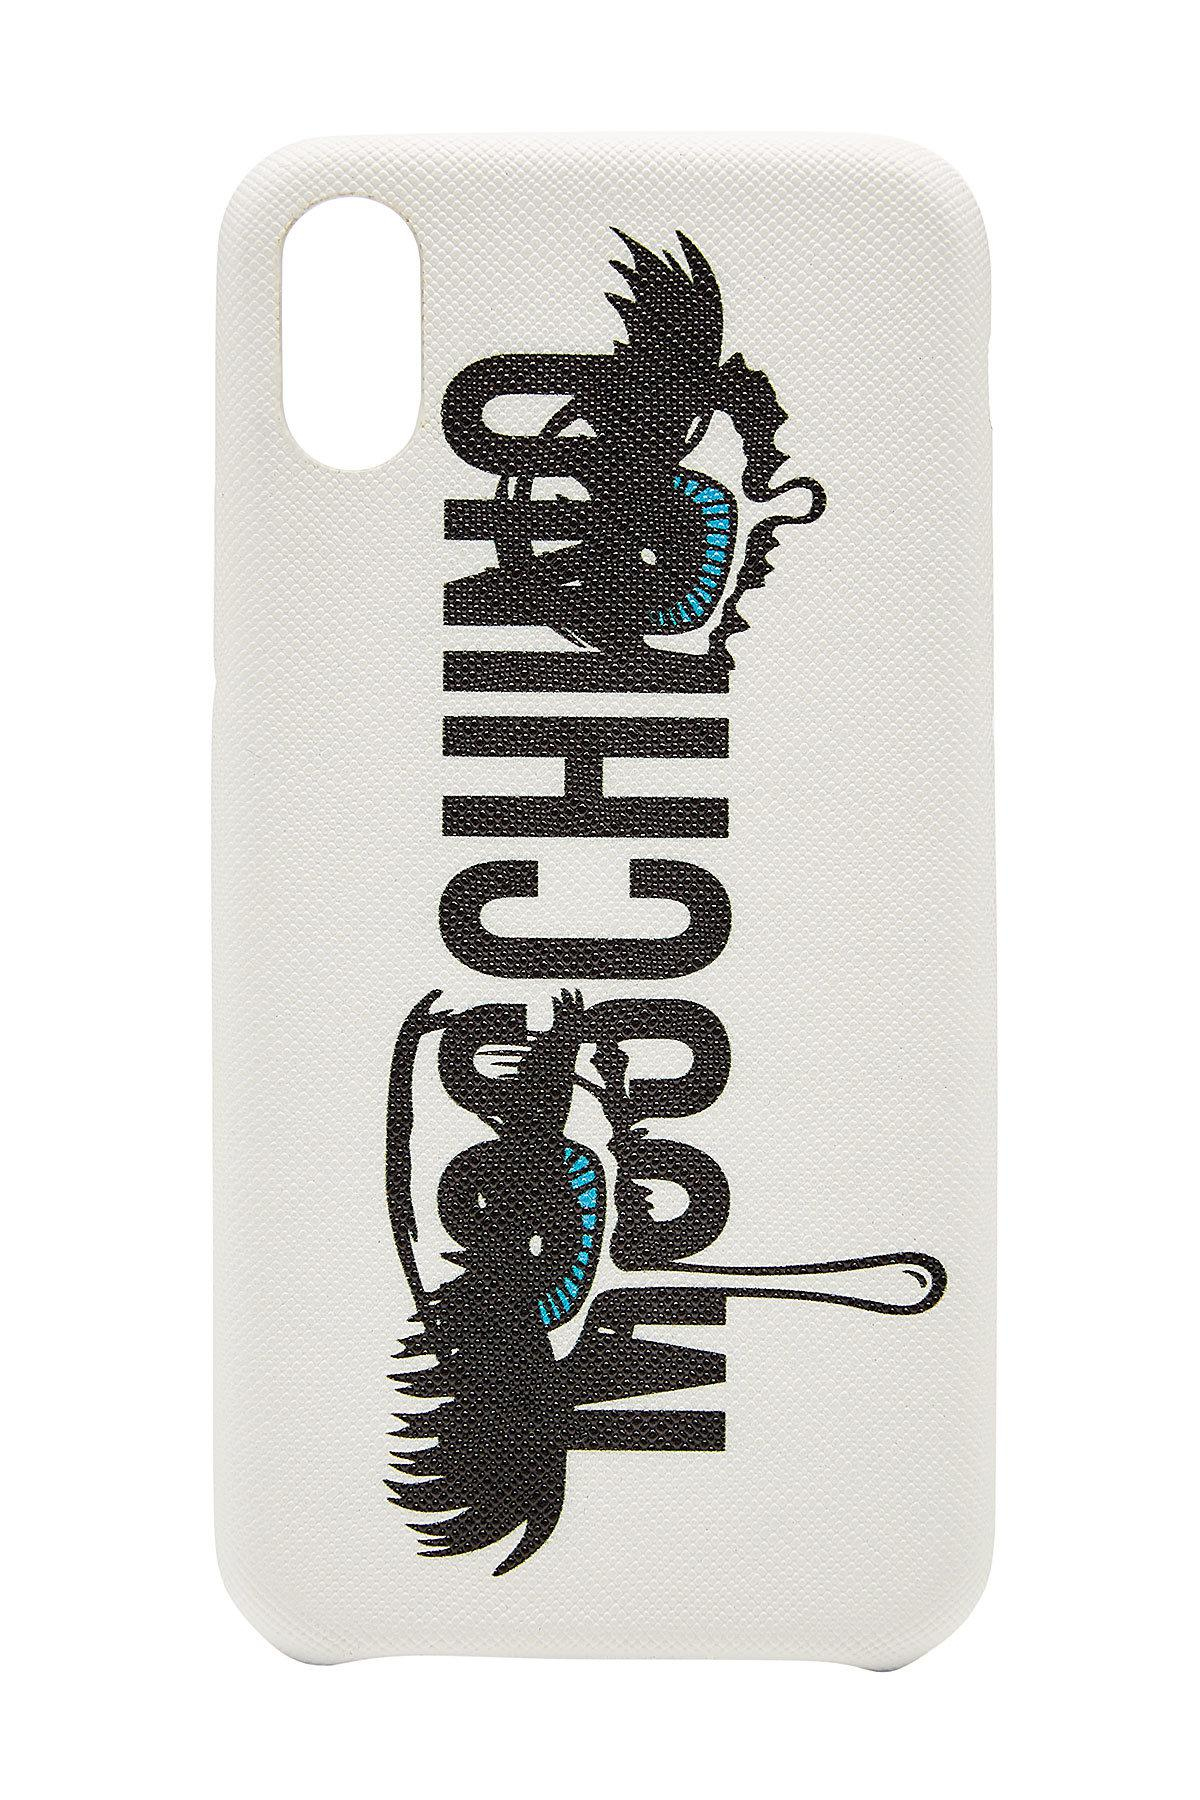 Moschino White Cover Iphone X bWglu